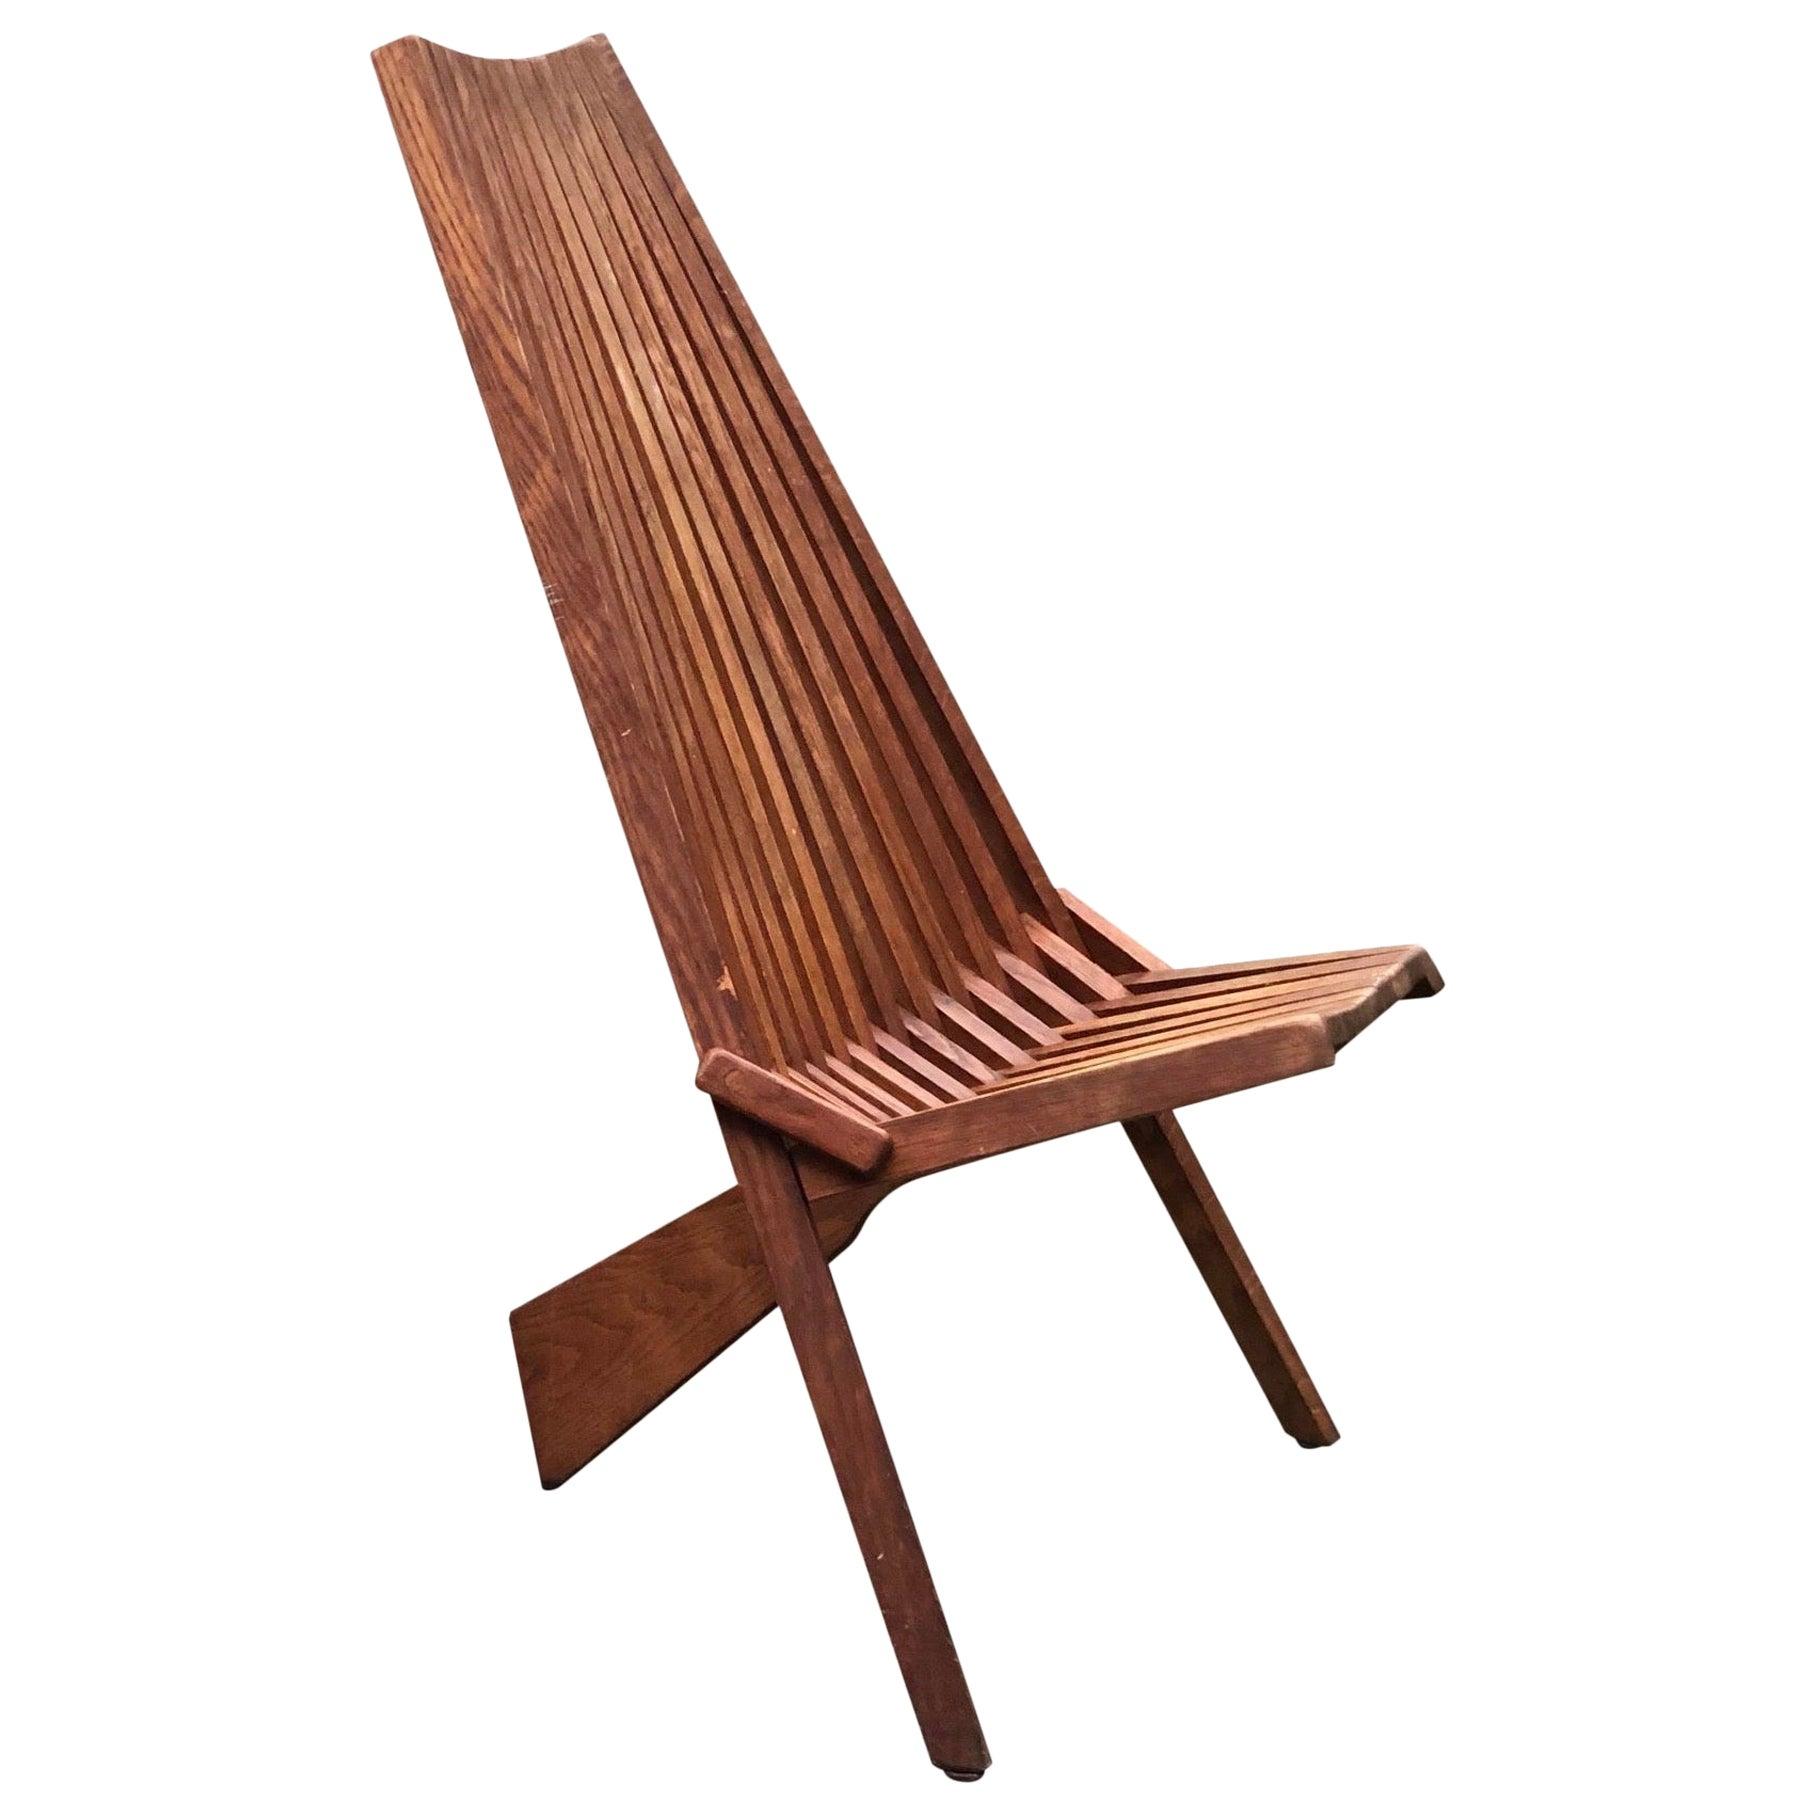 Vintage Mid-Century Modern Danish Teak Folding Slat Lounge Chair